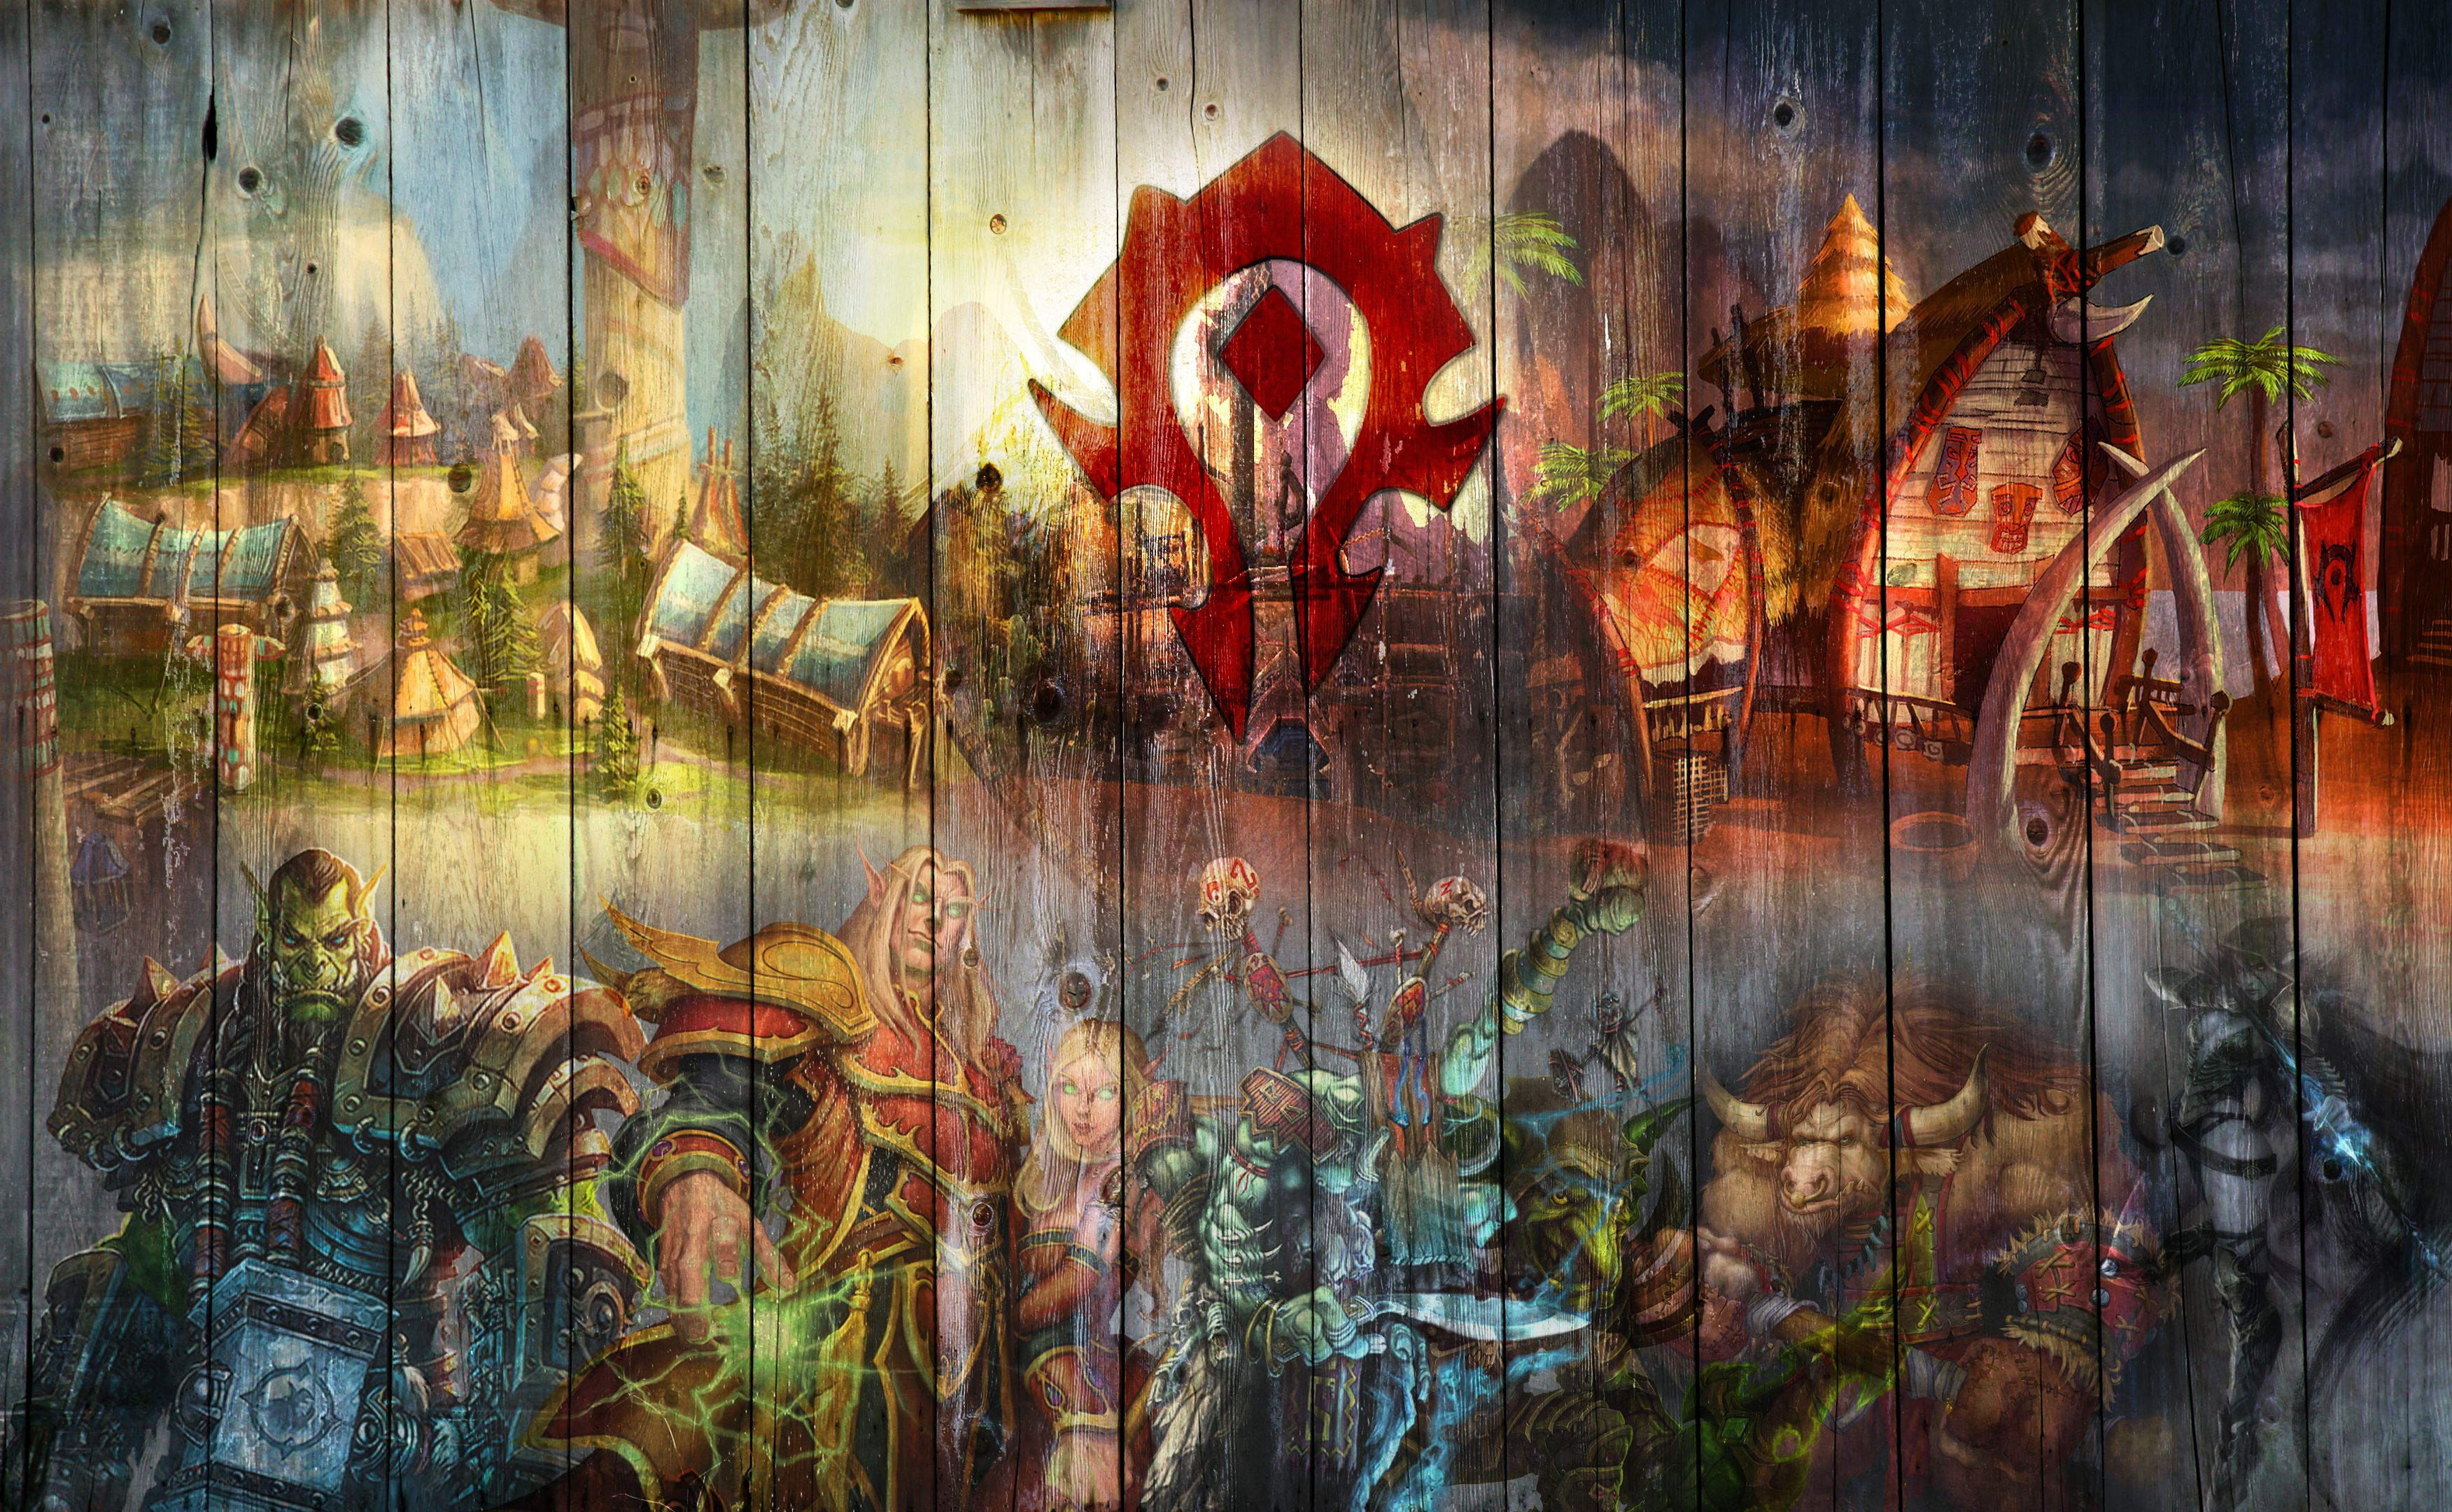 1080p world of warcraft phone wallpaper